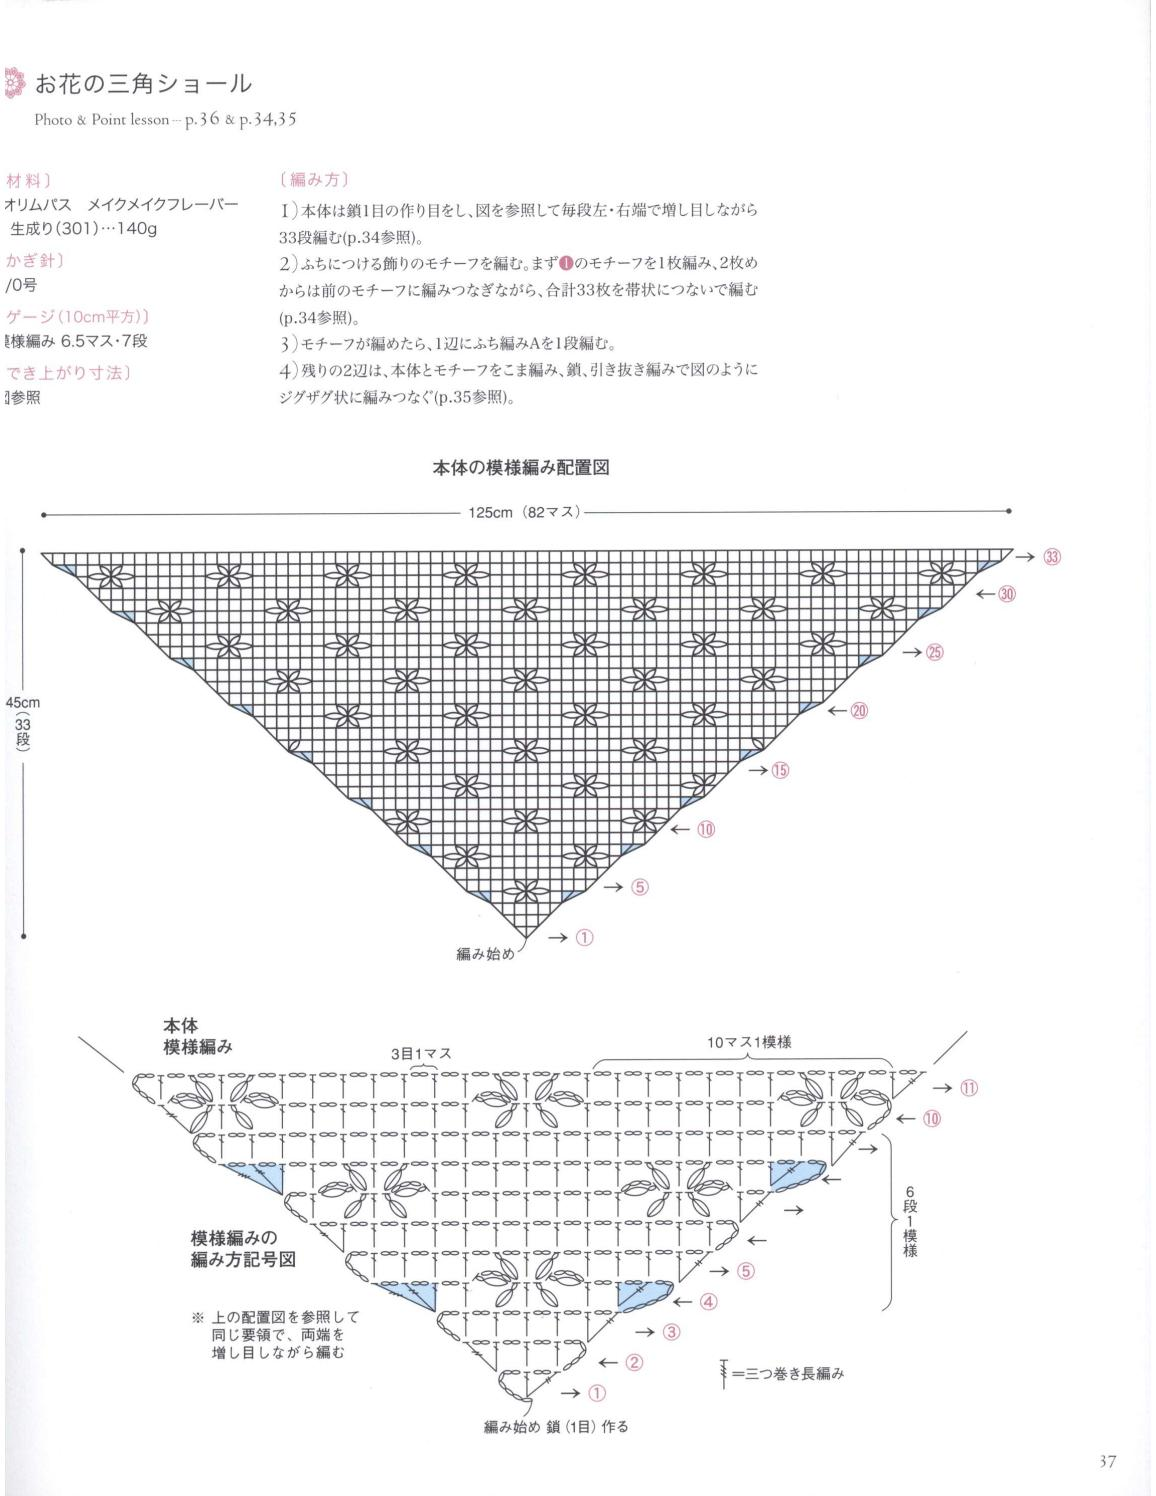 Asahi original crochet best selection 2012 page 37